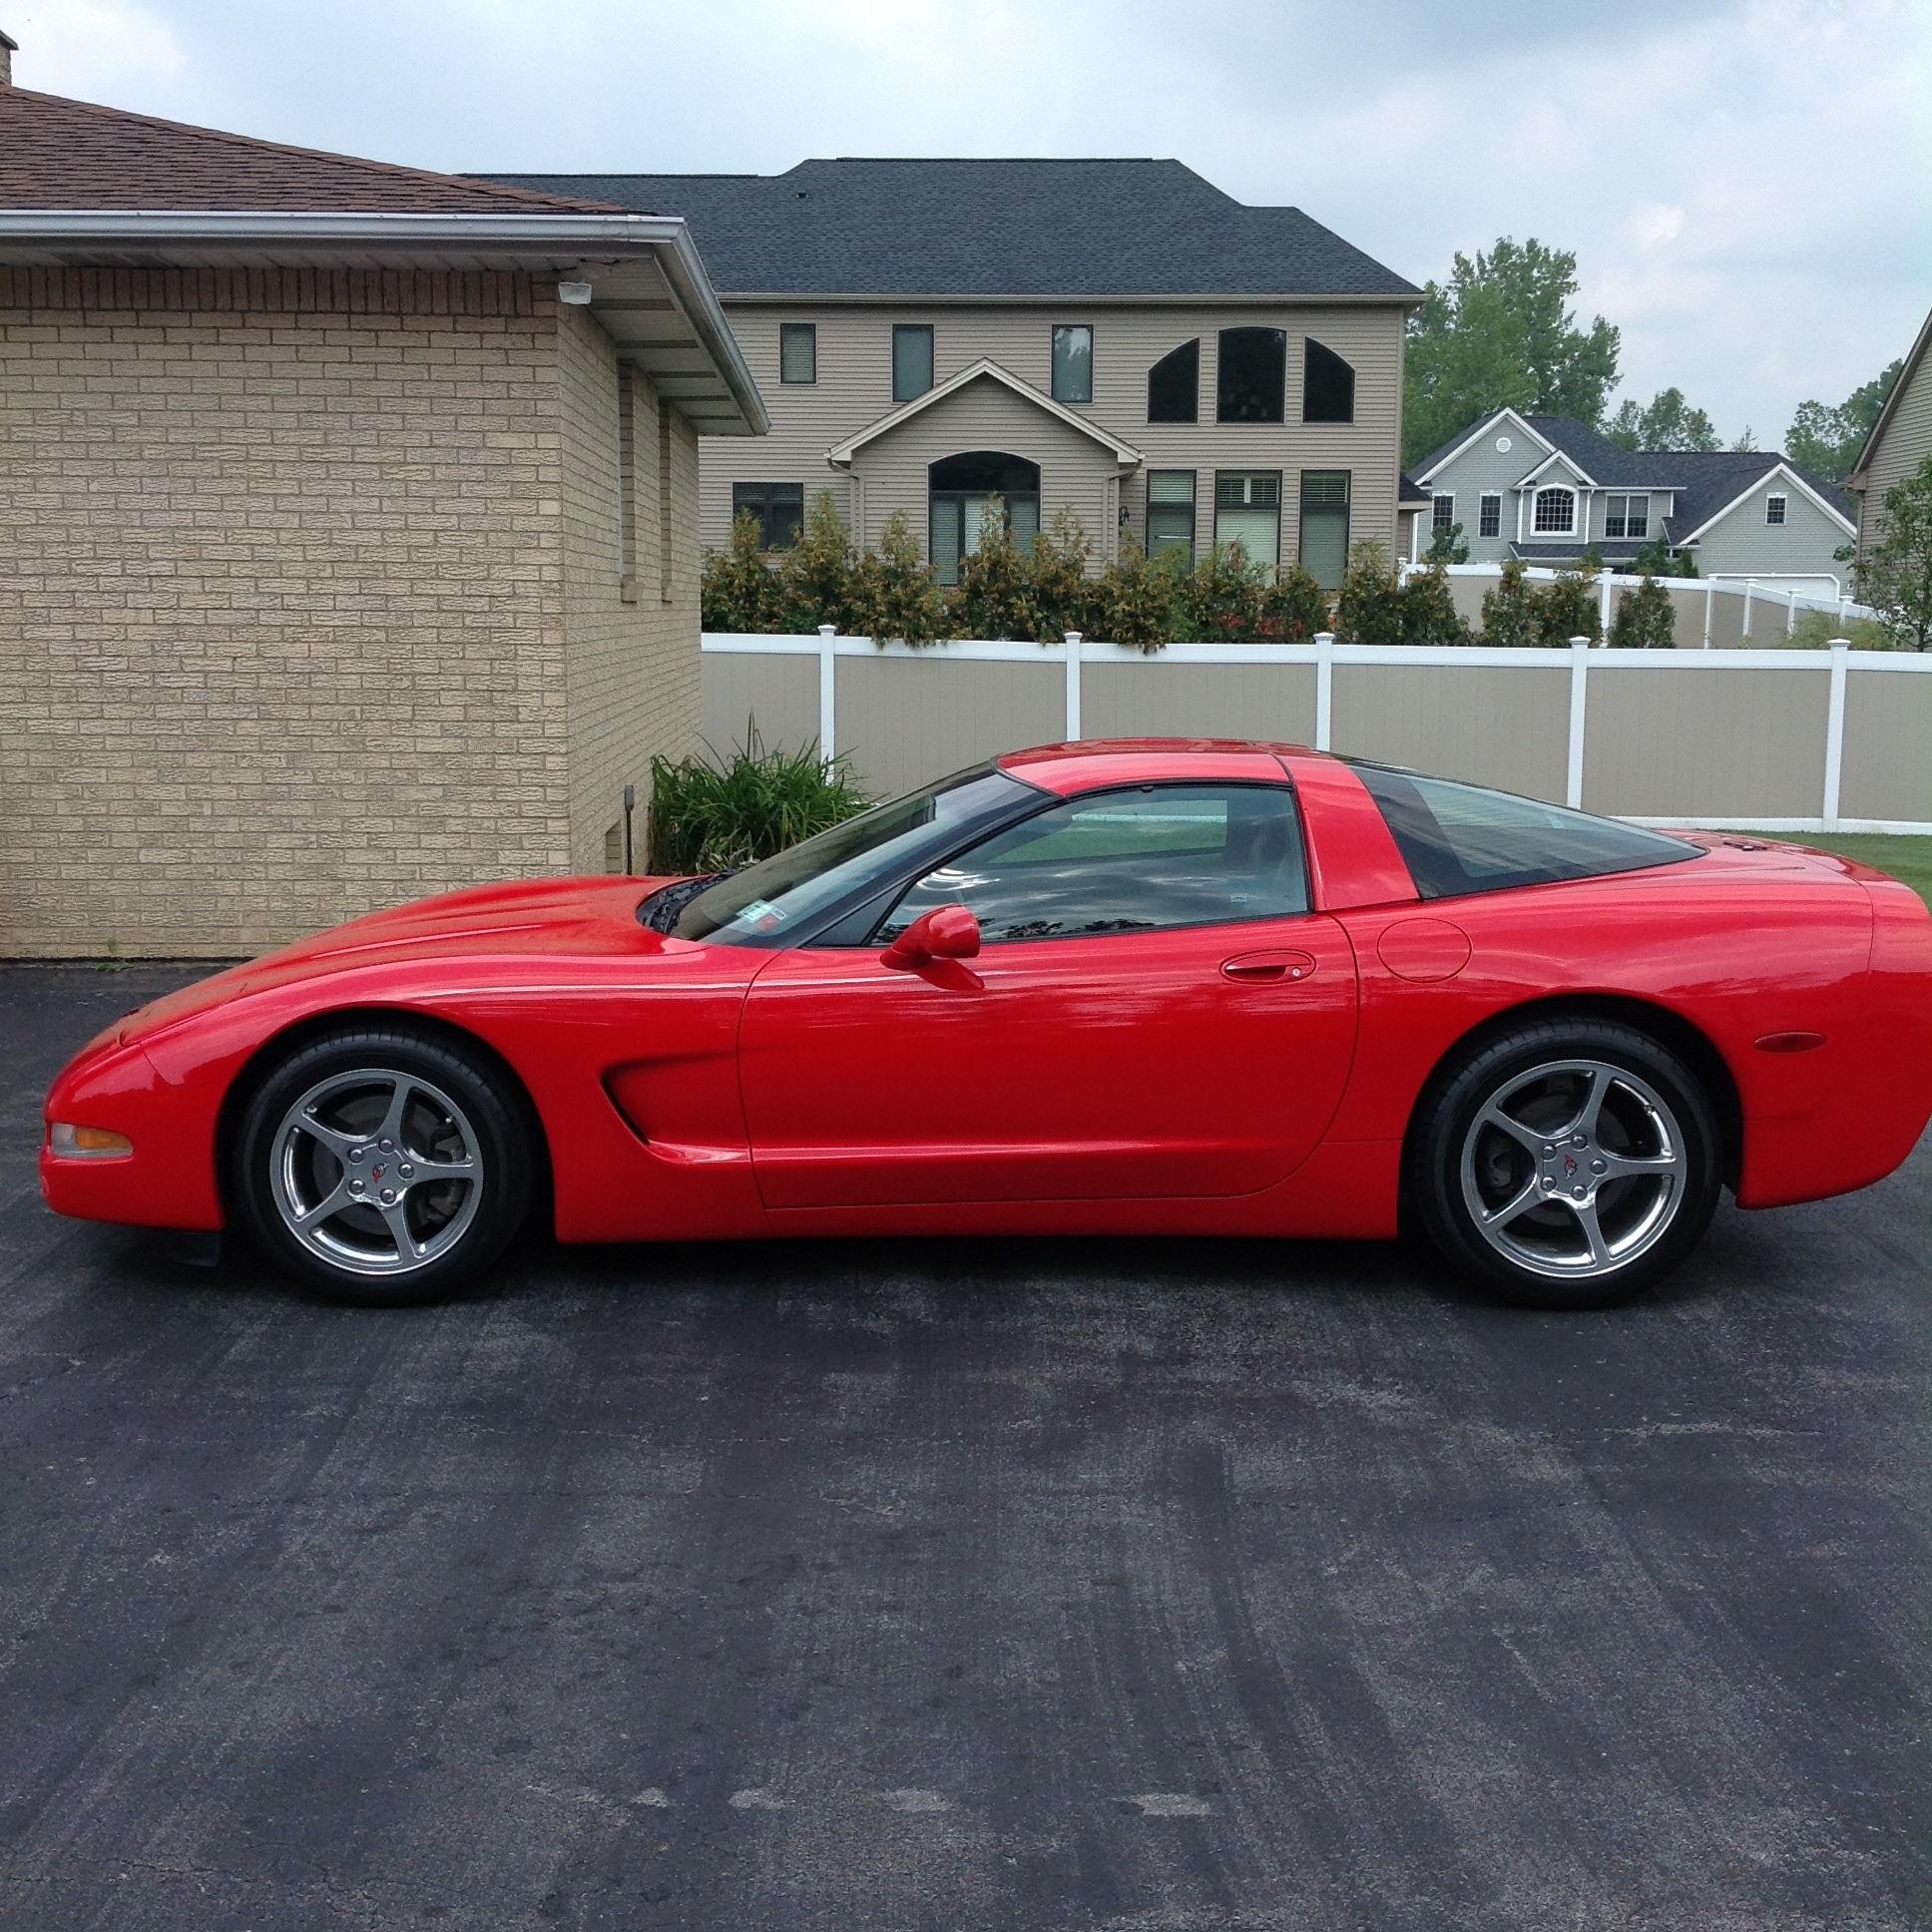 2000 torch red coupe m6 corvetteforum chevrolet corvette forum discussion. Black Bedroom Furniture Sets. Home Design Ideas